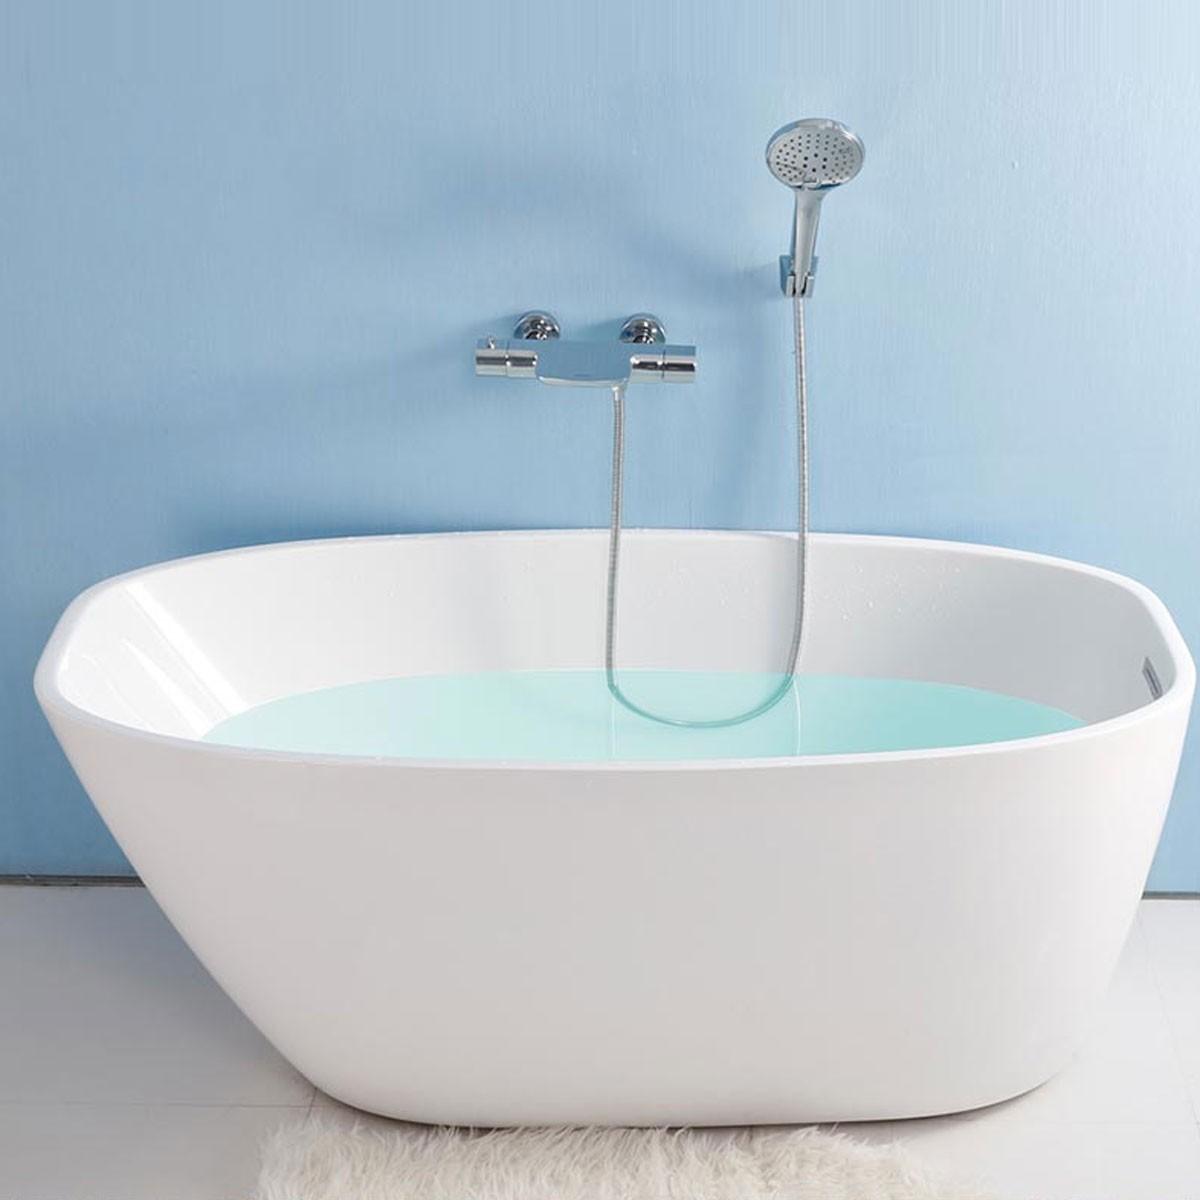 59 In Freestanding Bathtub - Acrylic White (DK-YU-15575 ...